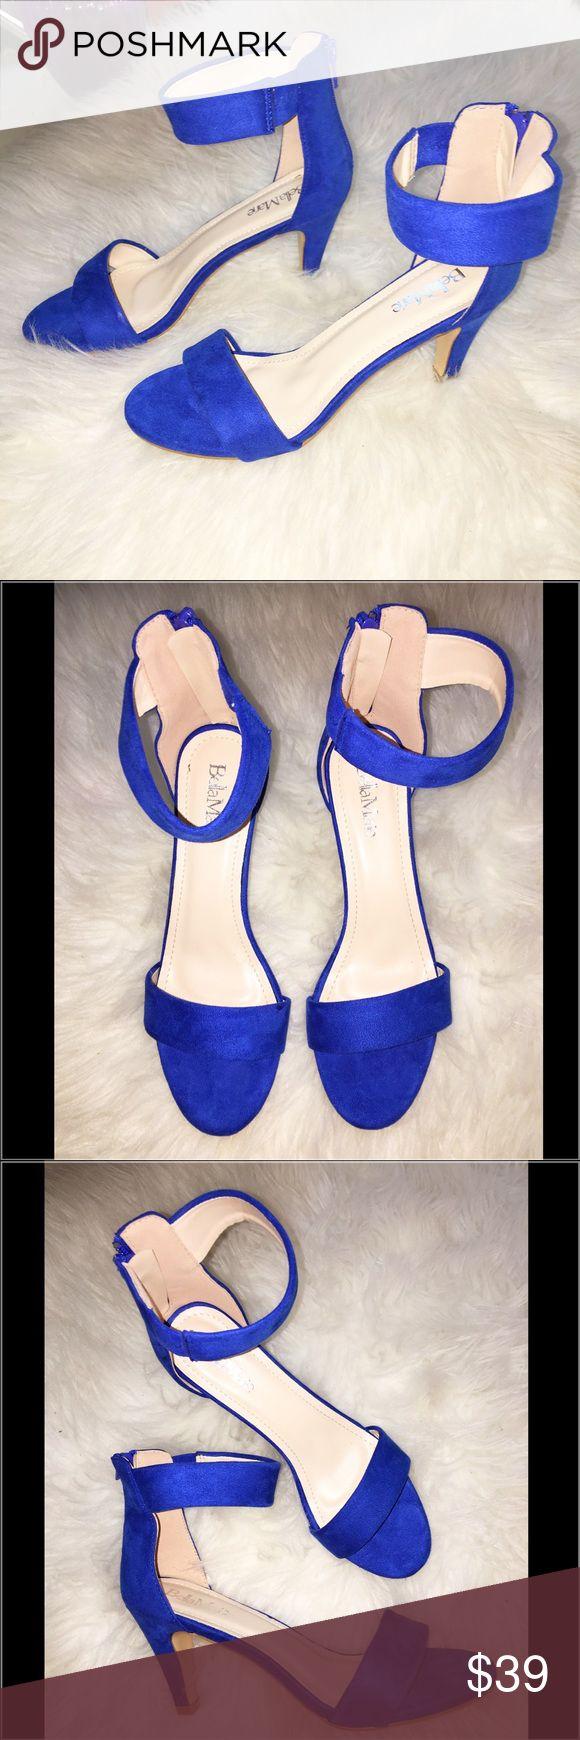 "NIB Cobalt Blue Open Toe Sandals Brand new inbox Cobalt Blue Faux Suede Open Toe Sandals. Size 7.5 with a 2.75"" inch heel. Very comfortable! Shoes Sandals"